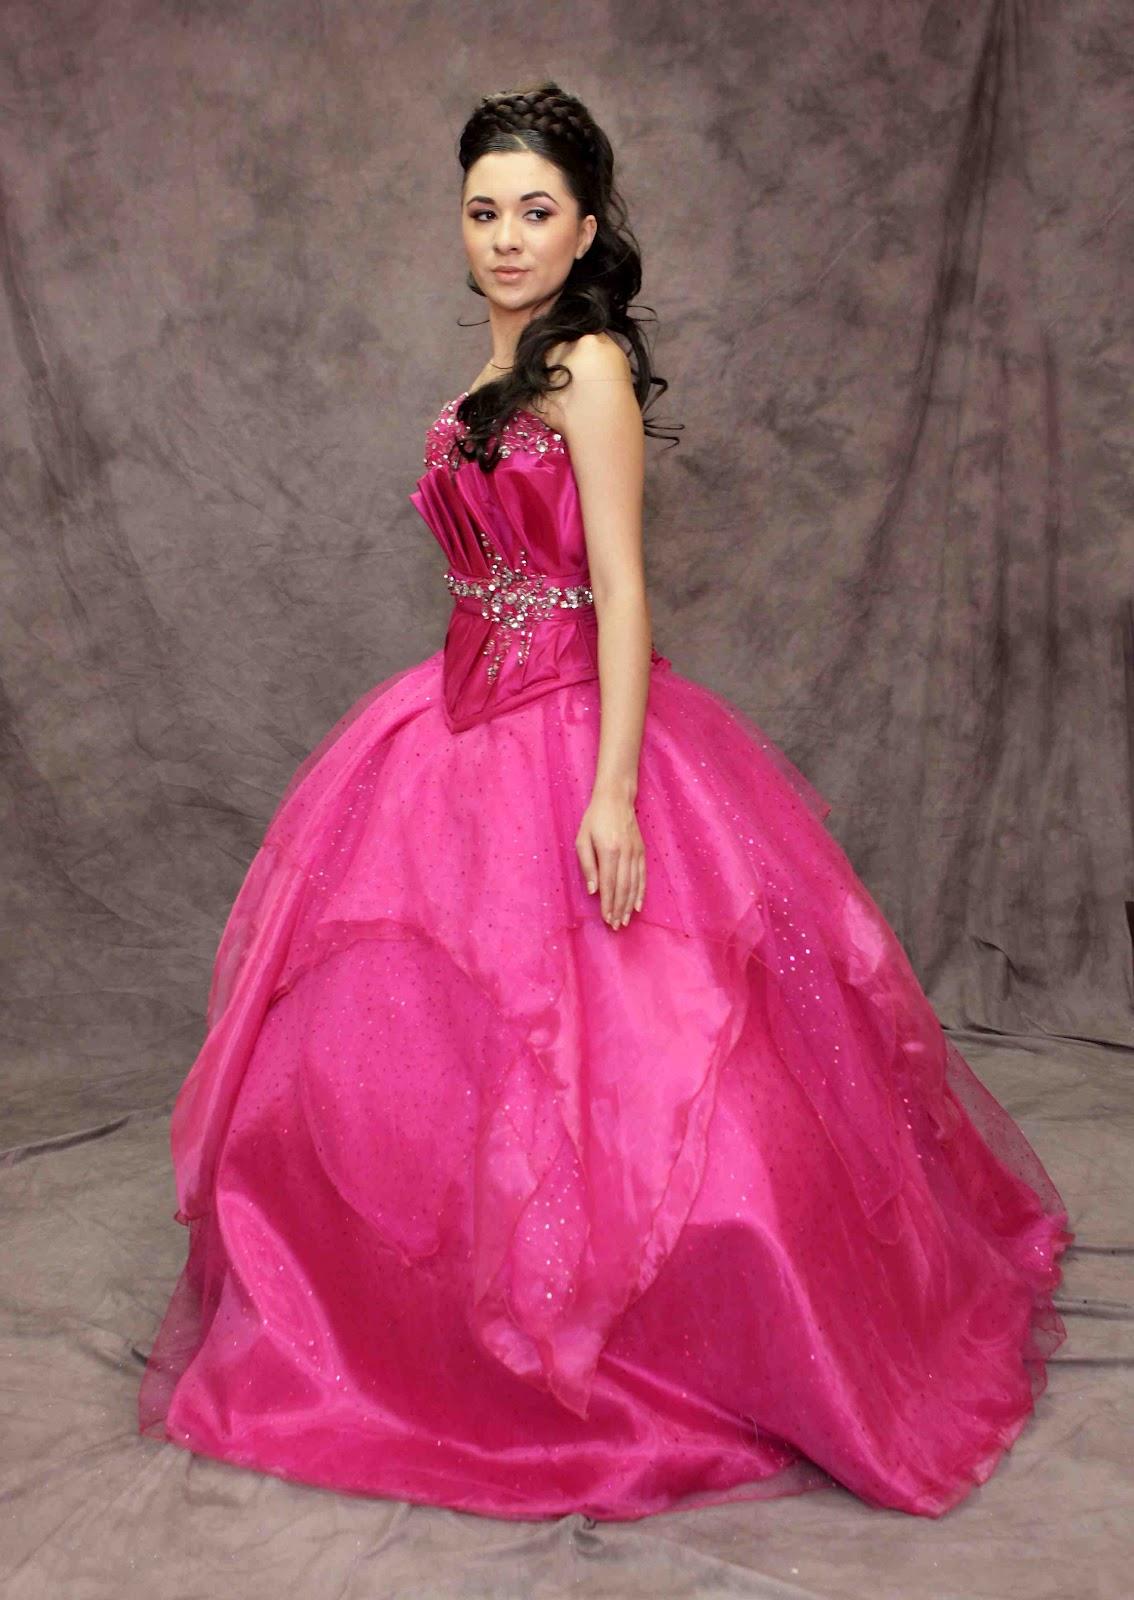 83fbb42a3d Quinceanera Dresses in Houston  Tomas Benitez Quinceanera Dresses